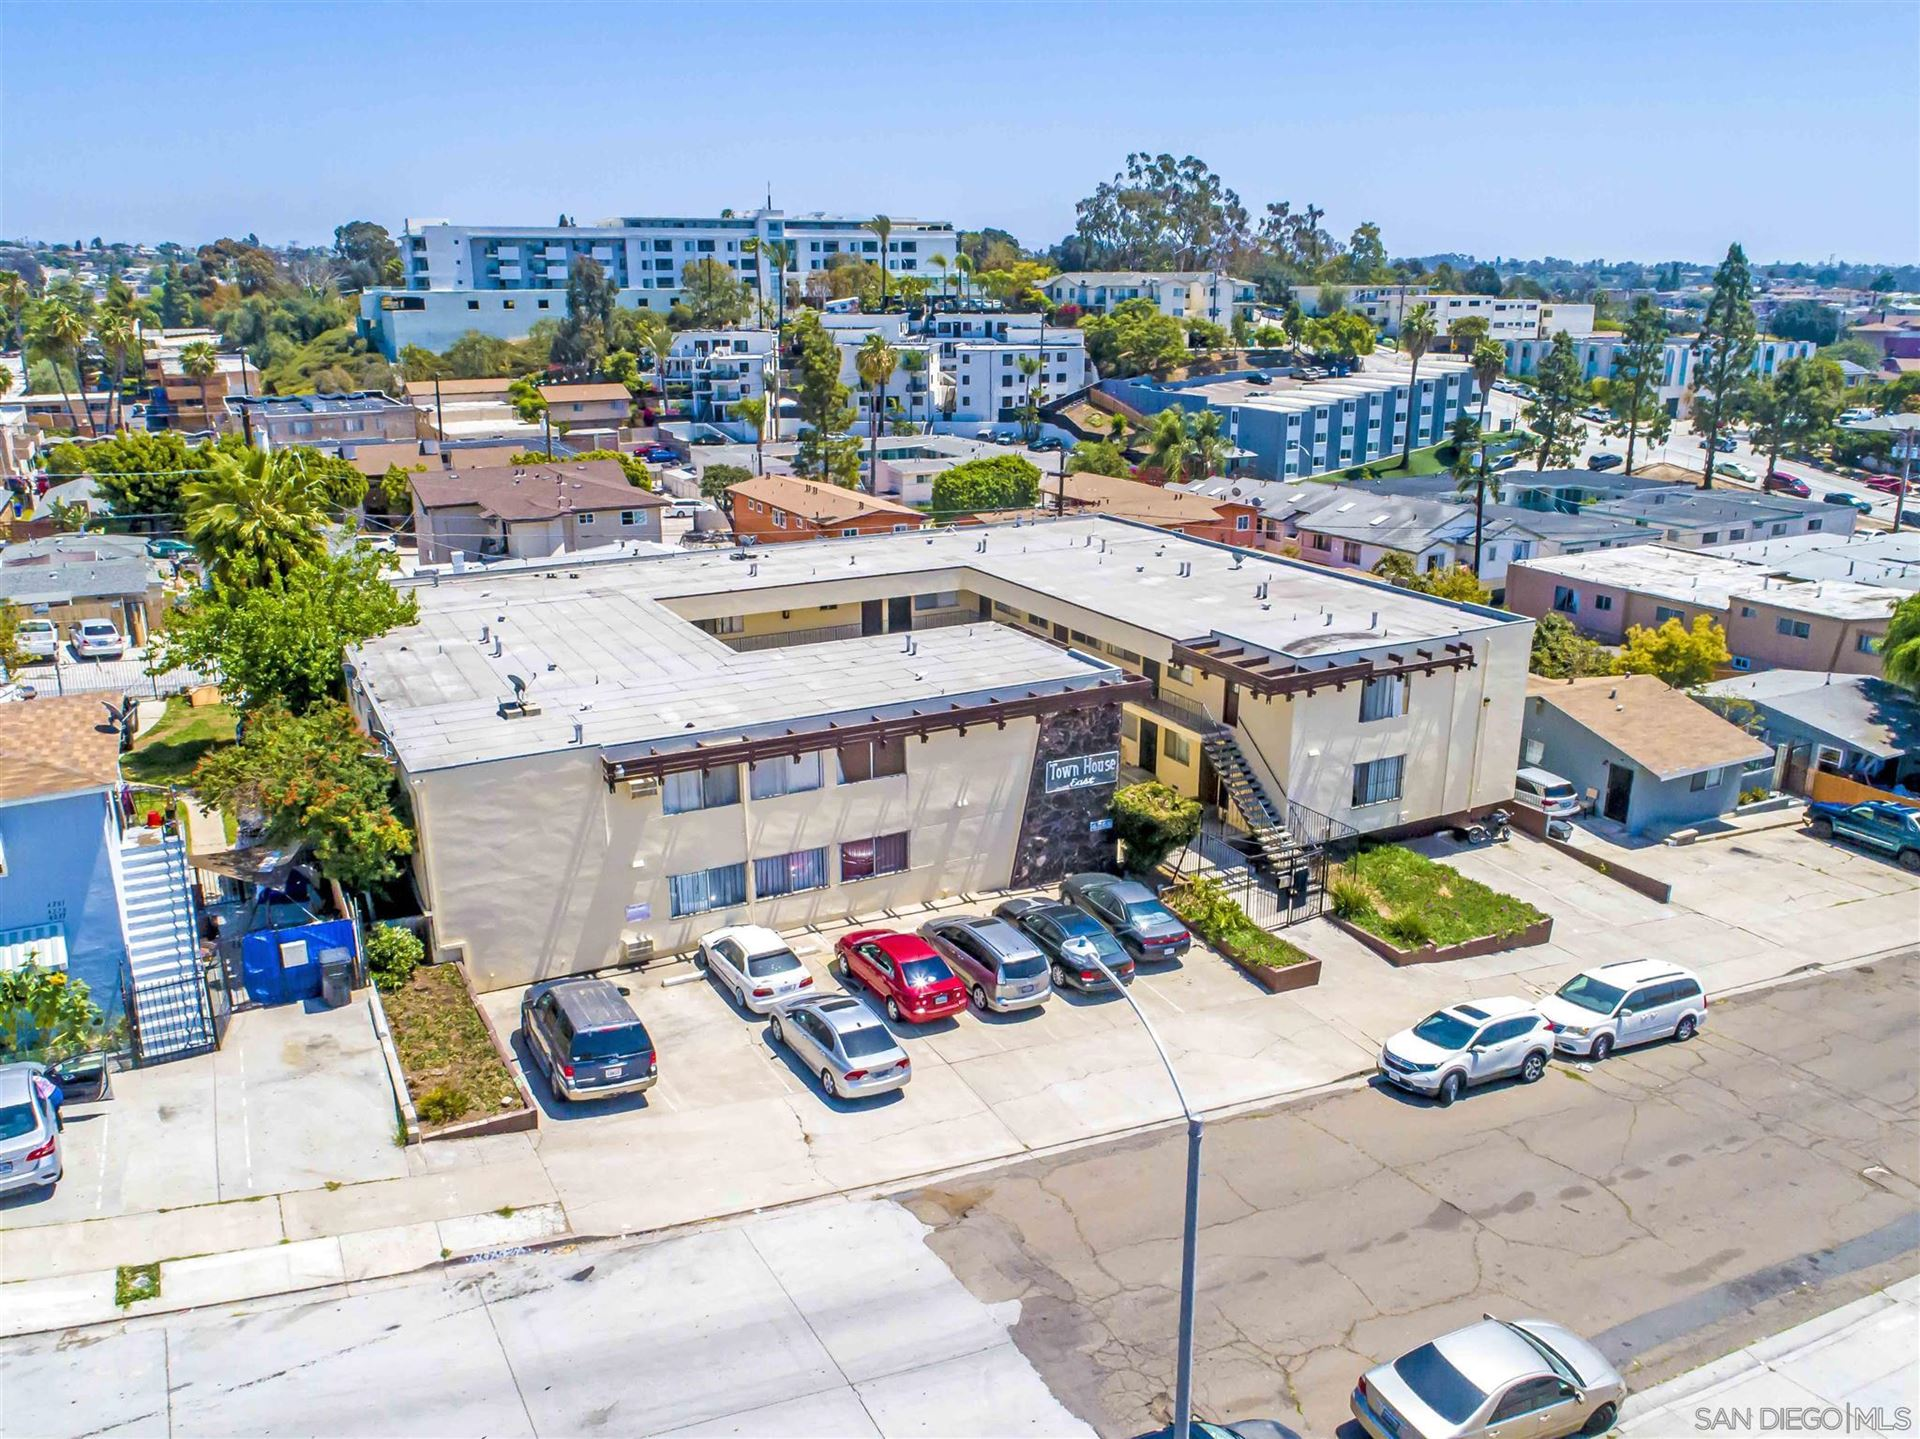 Photo of 4265 Altadena Ave, San Diego, CA 92115 (MLS # 210014890)